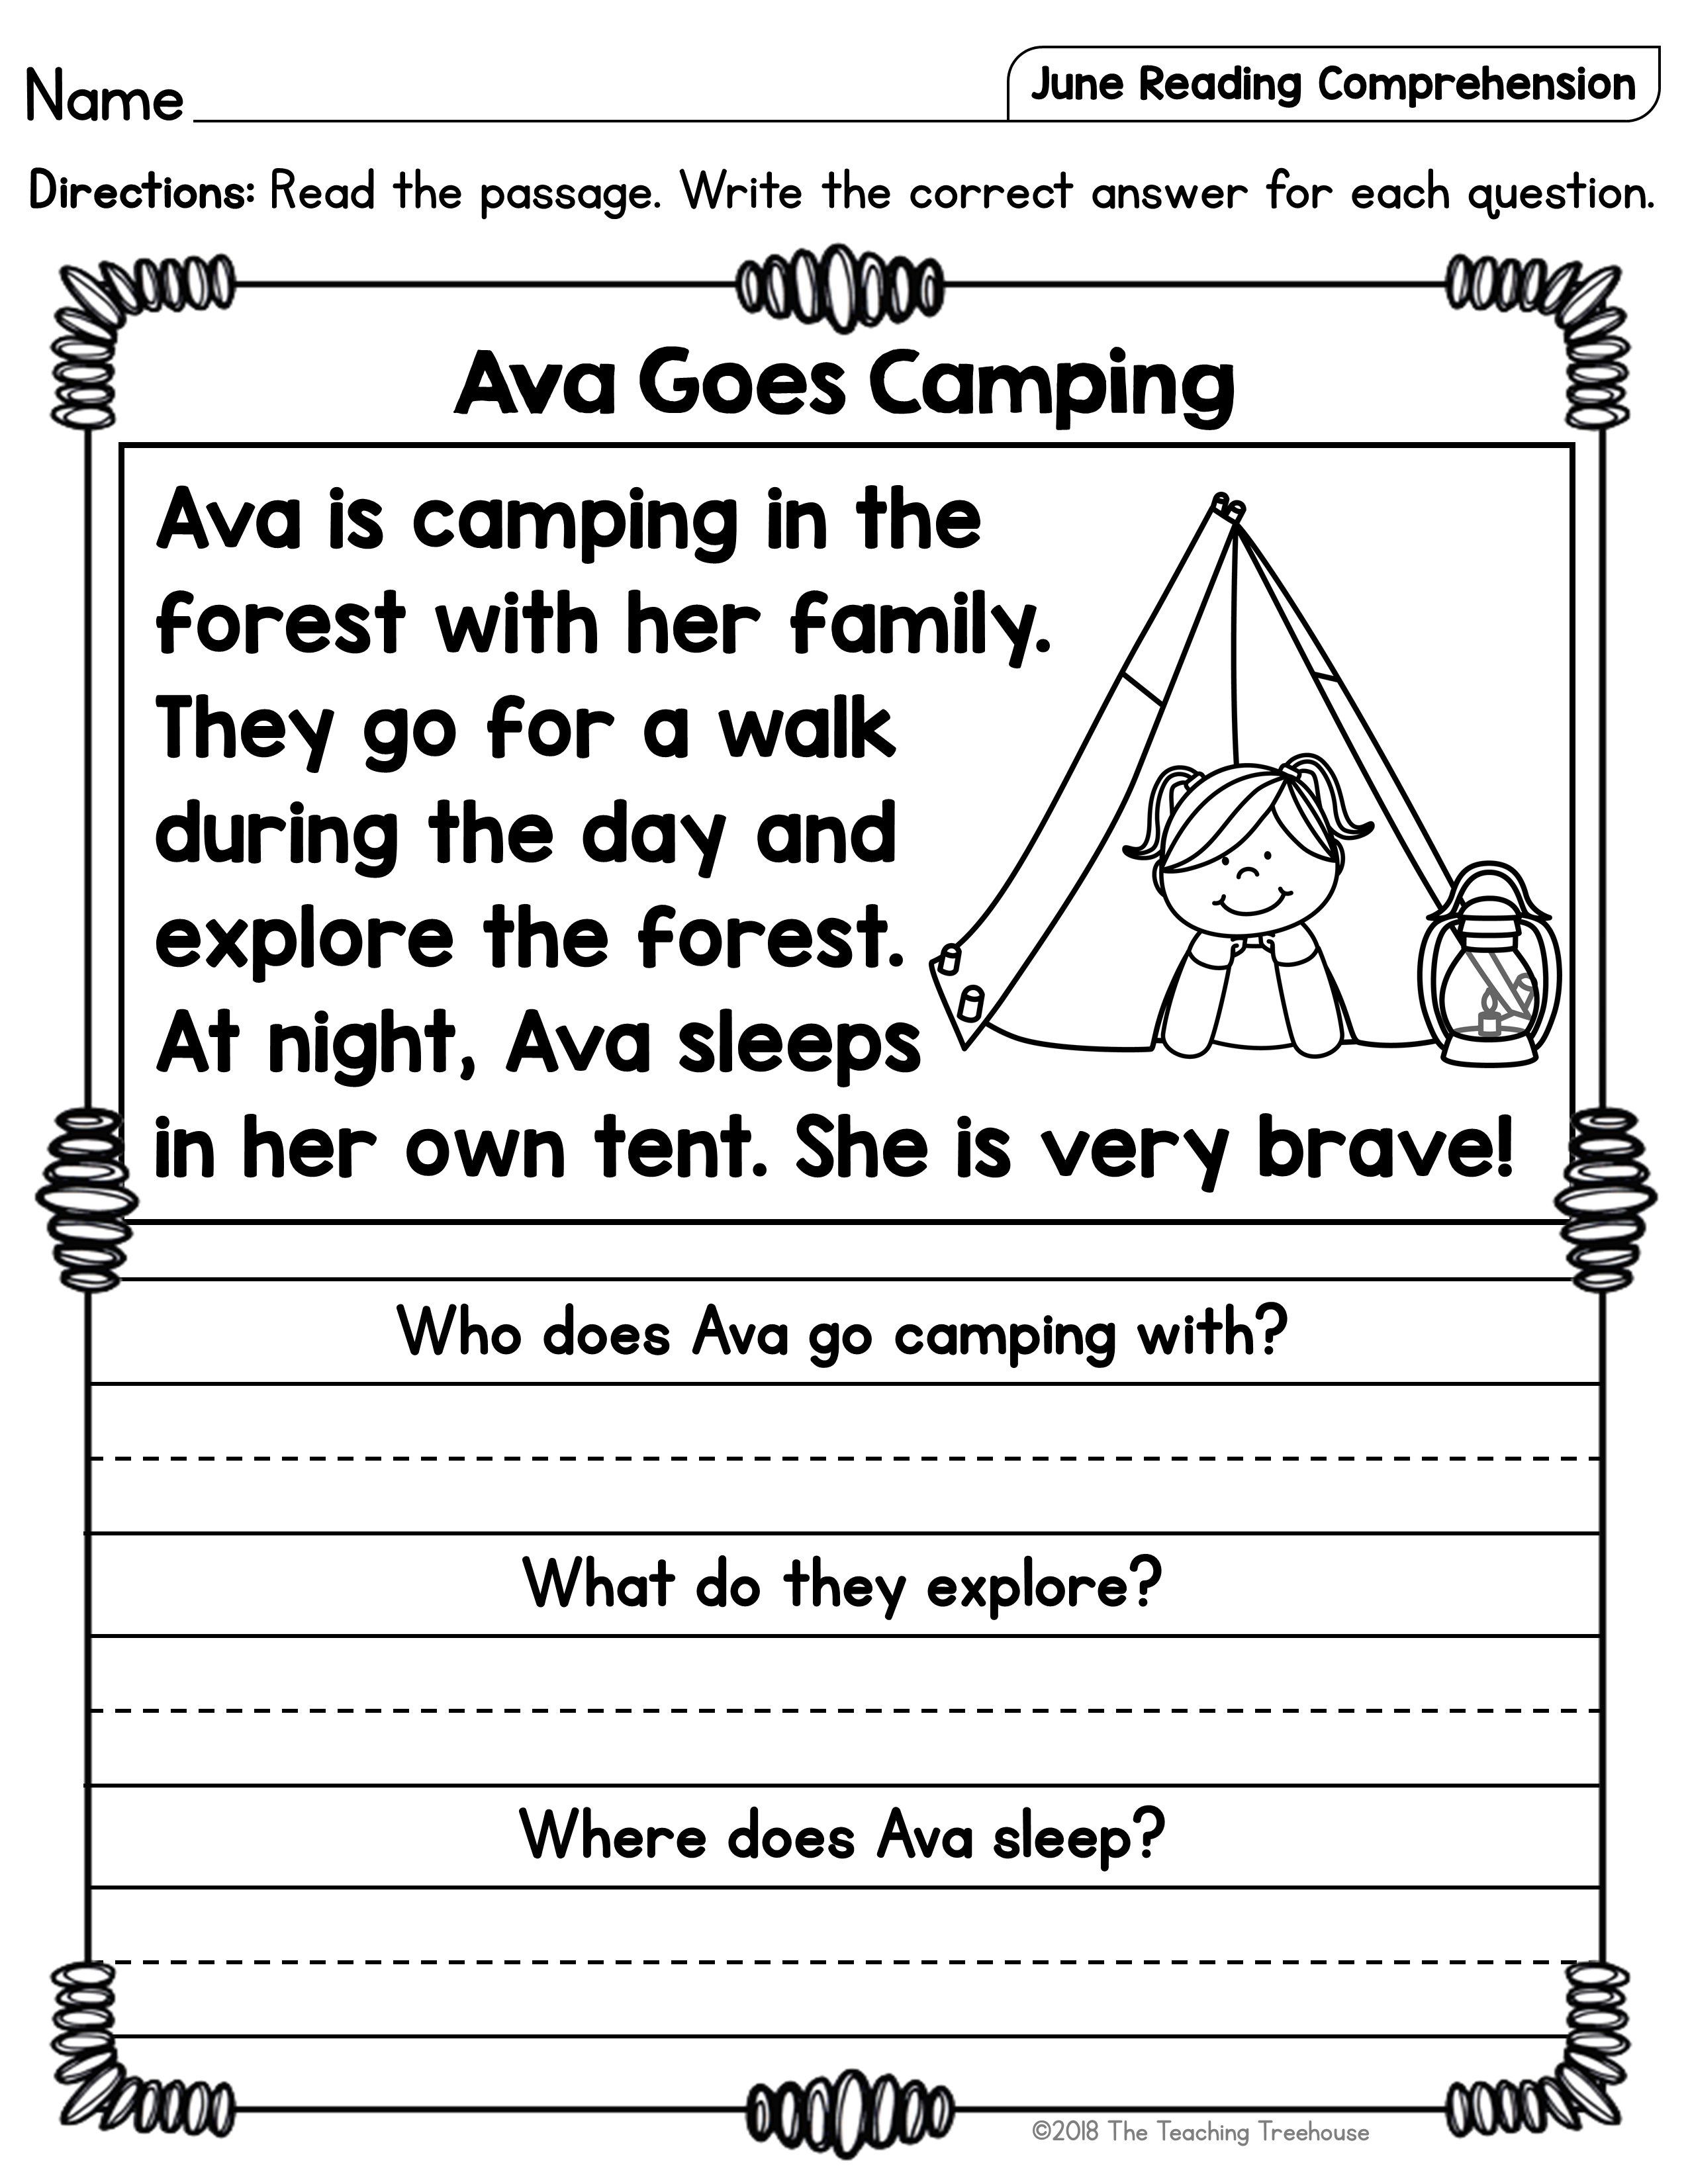 hight resolution of June Reading Comprehension Passages for Kindergarten and First Grade    Reading comprehension worksheets